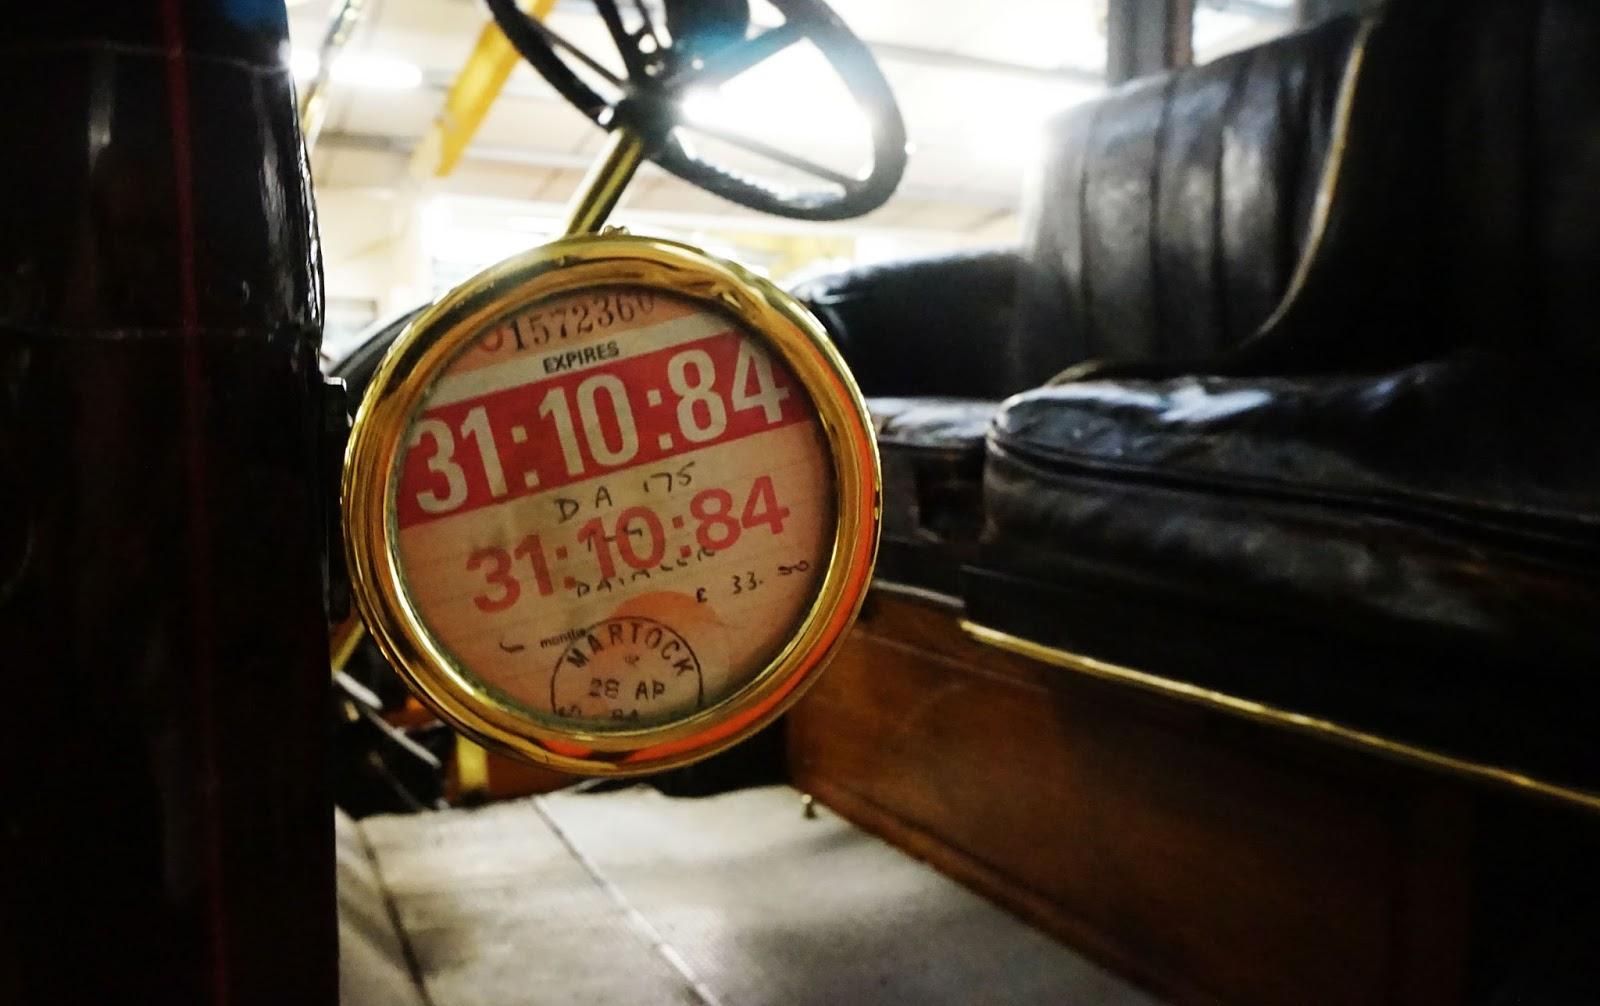 classic car tax disc 1984 history nostalgic haynes motor museum